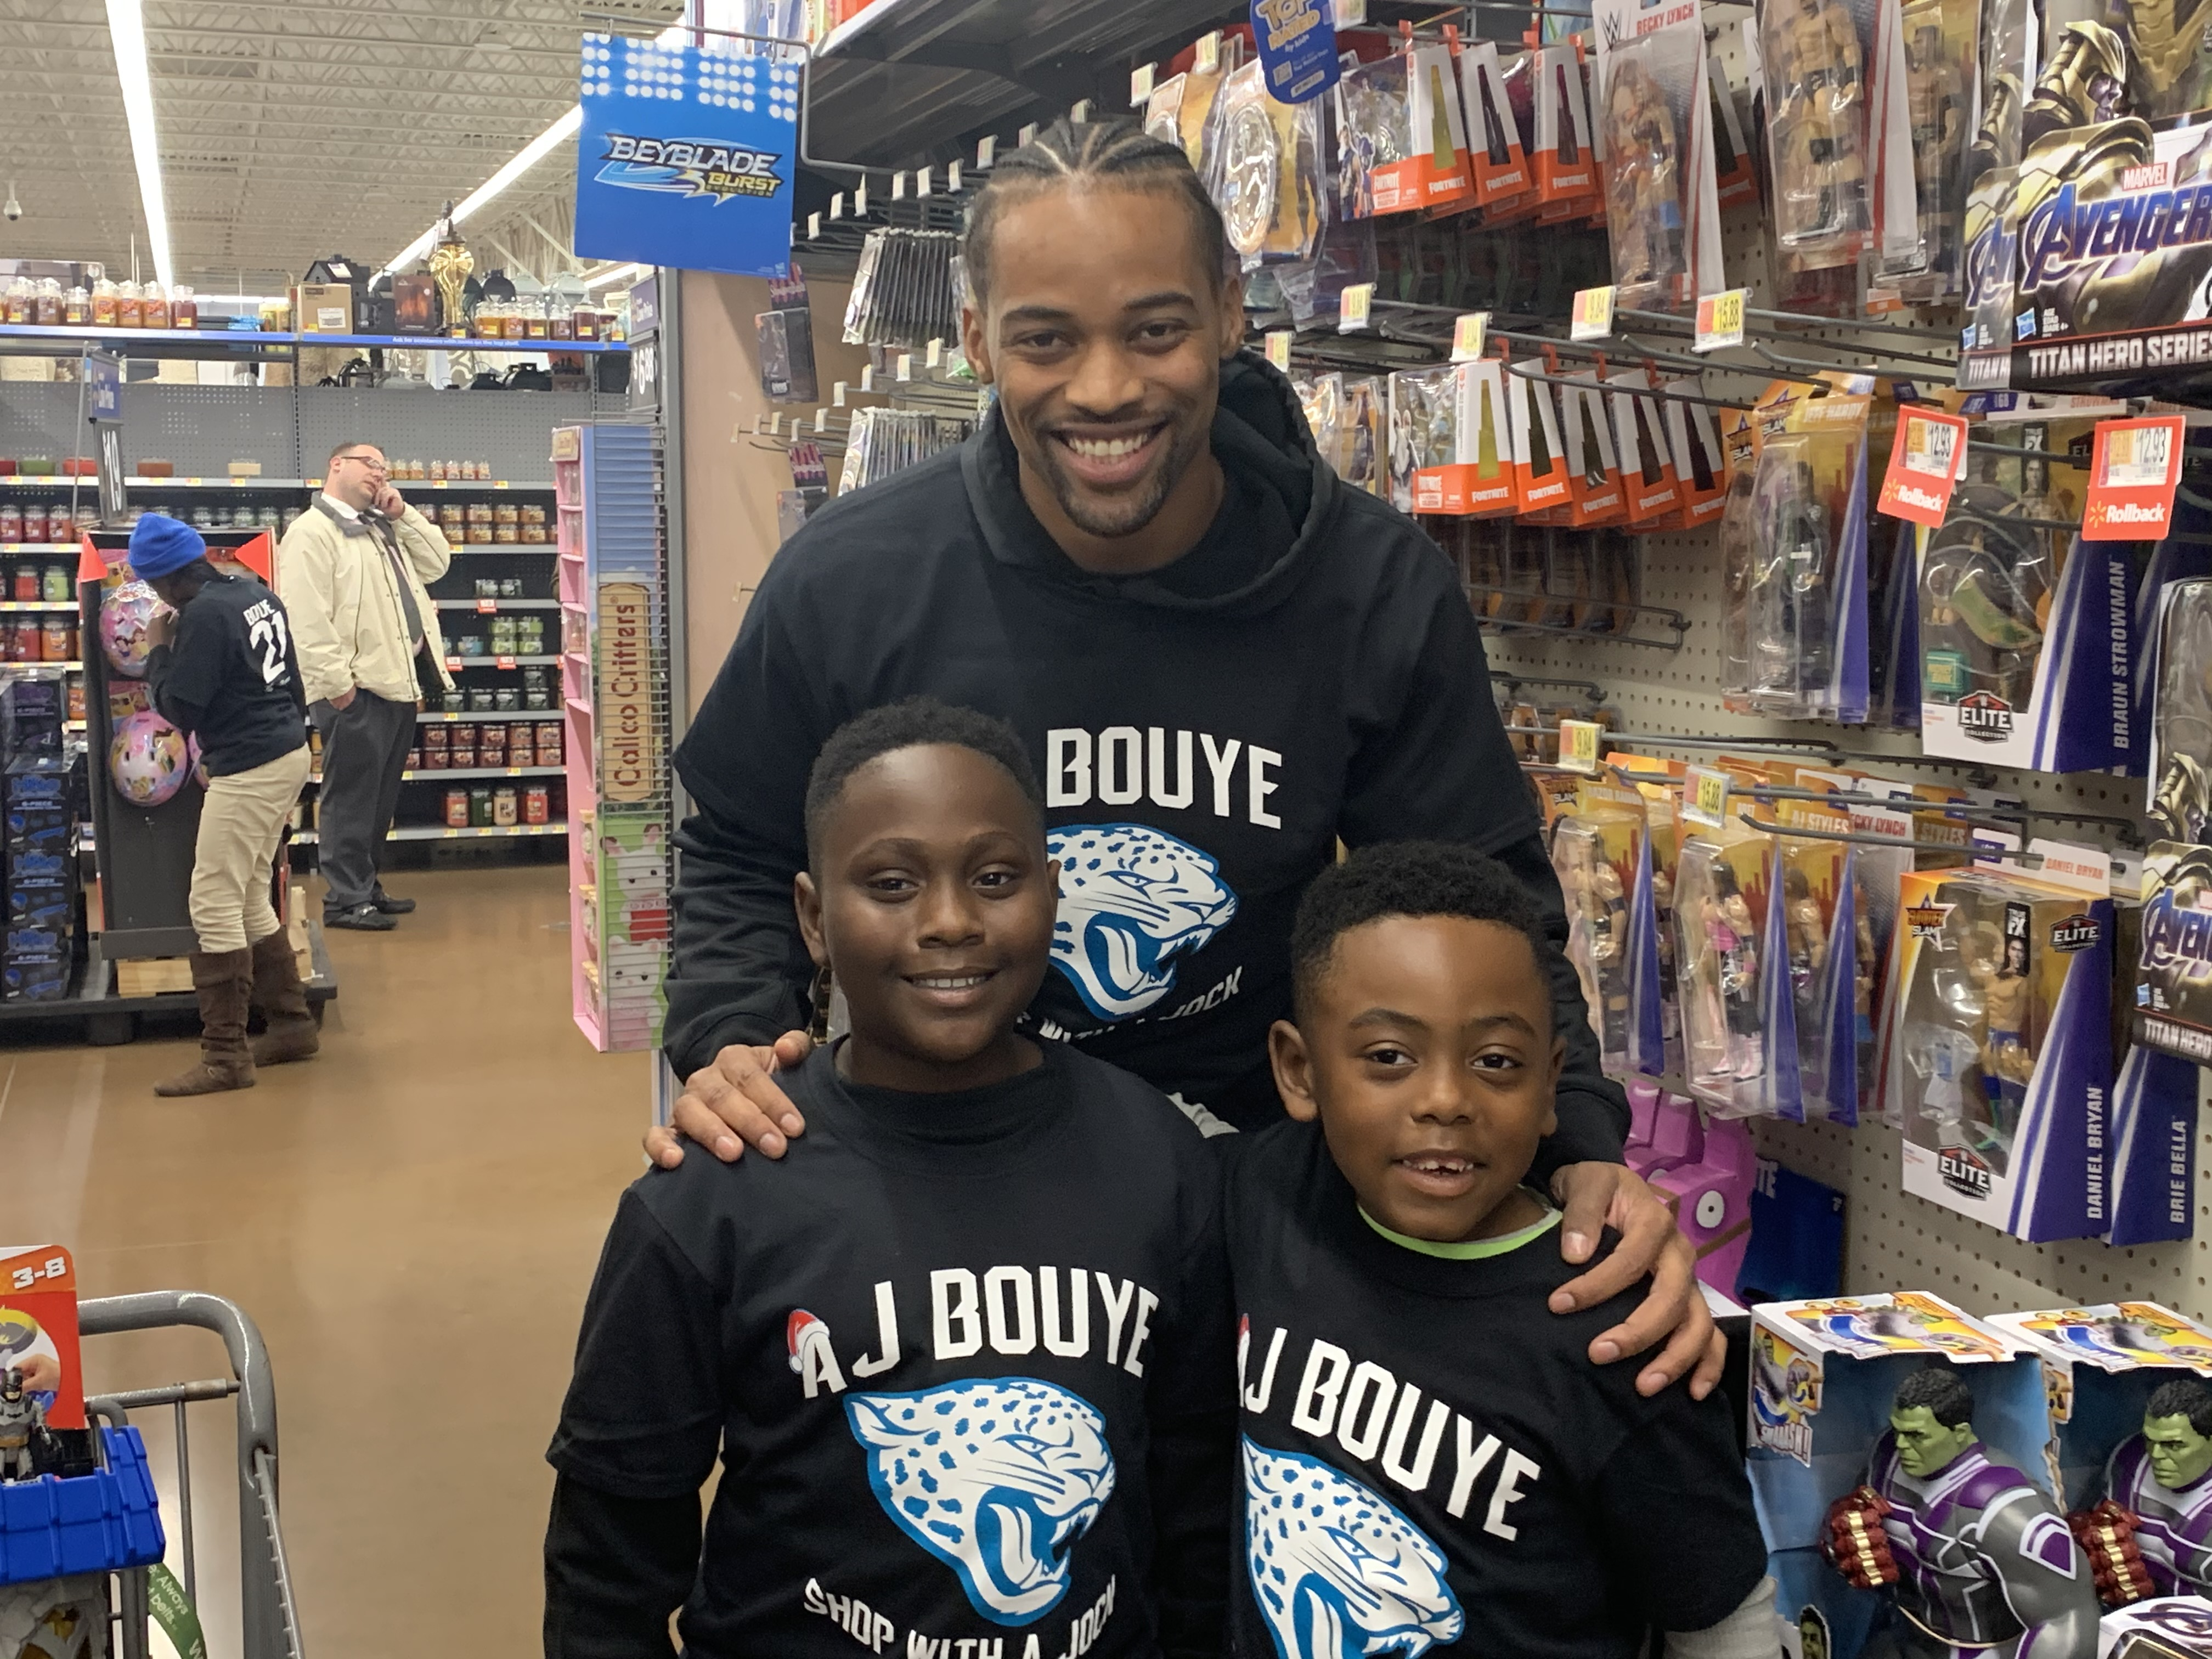 A.J. Bouye and Jaguars Teammates Take Boys & Girls Club Children Holiday Shopping